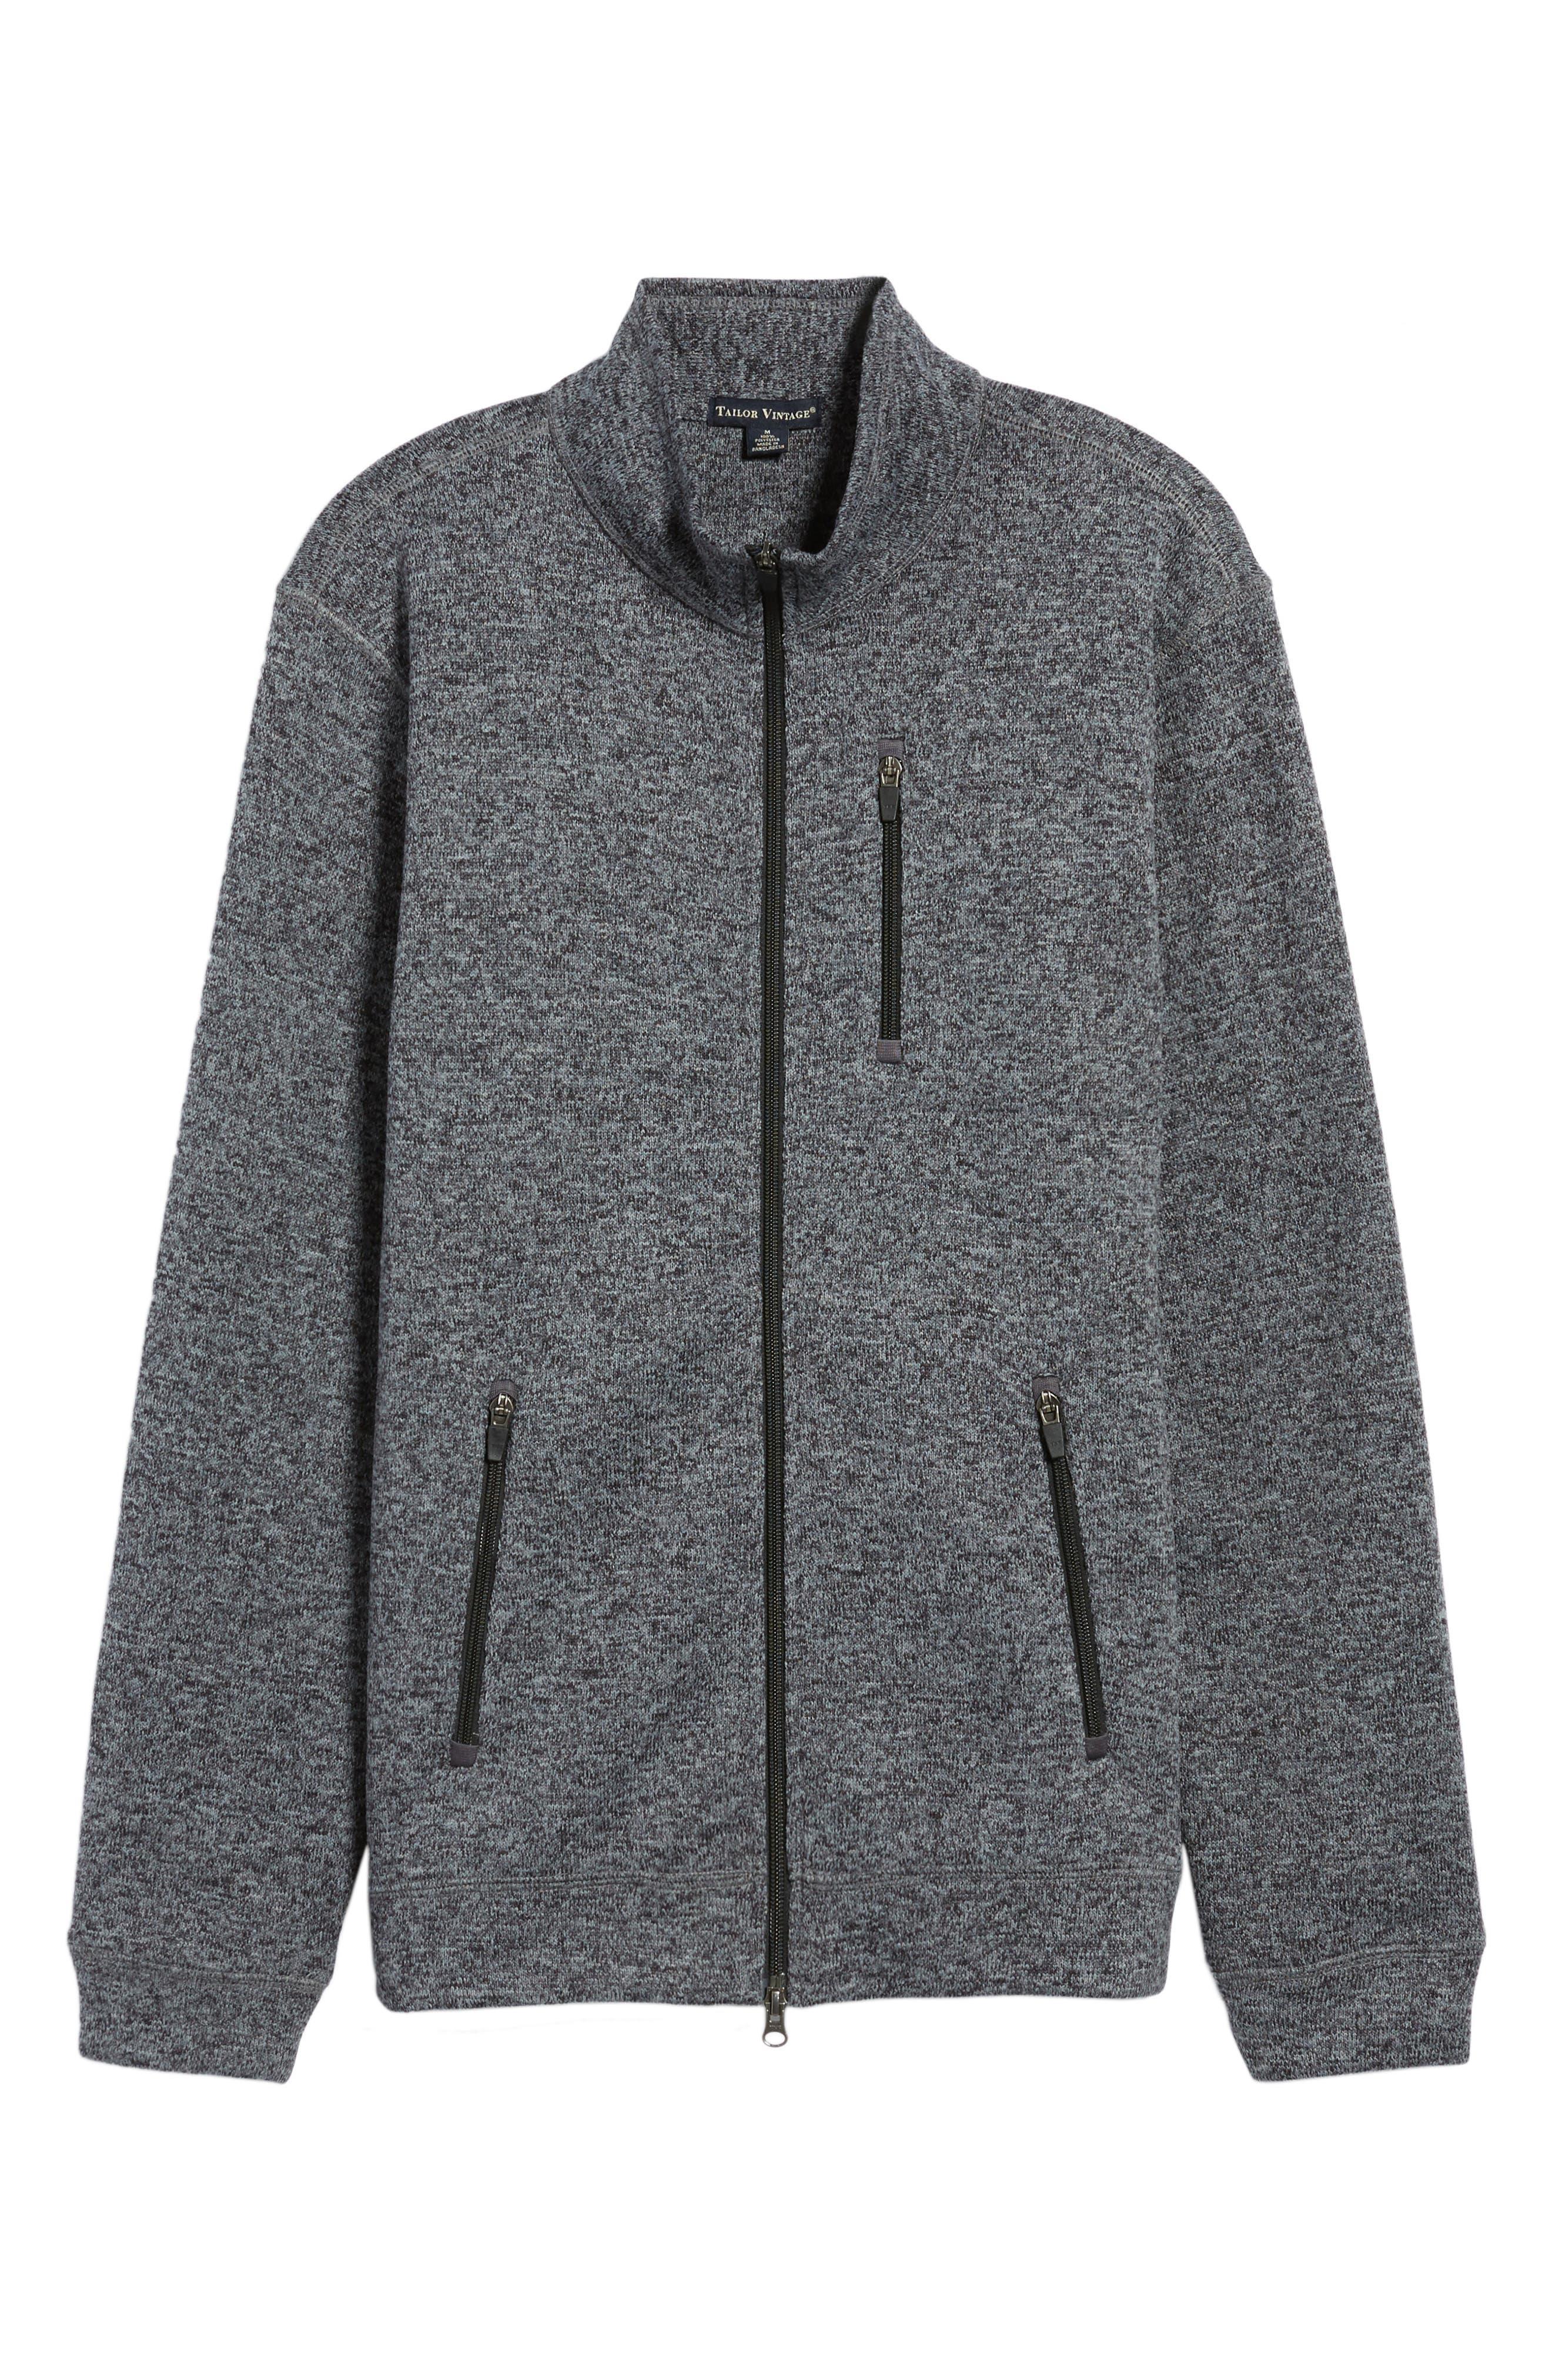 Sweater Knit Fleece Zip Front Jacket,                             Alternate thumbnail 16, color,